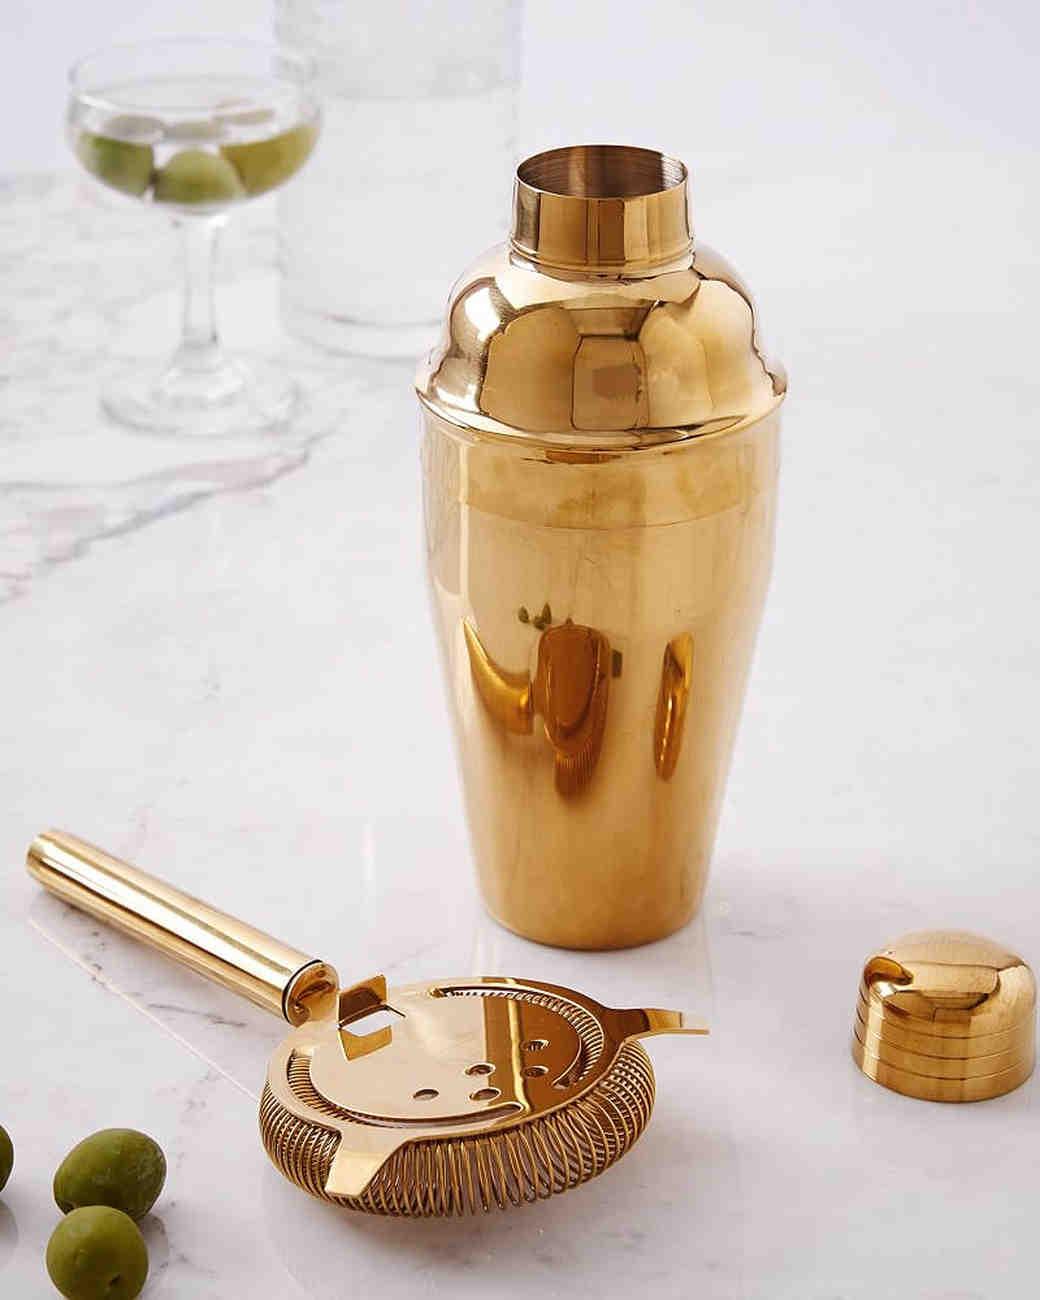 engagement-gifts-west-elm-cocktail-shaker-strainer-0316.jpg